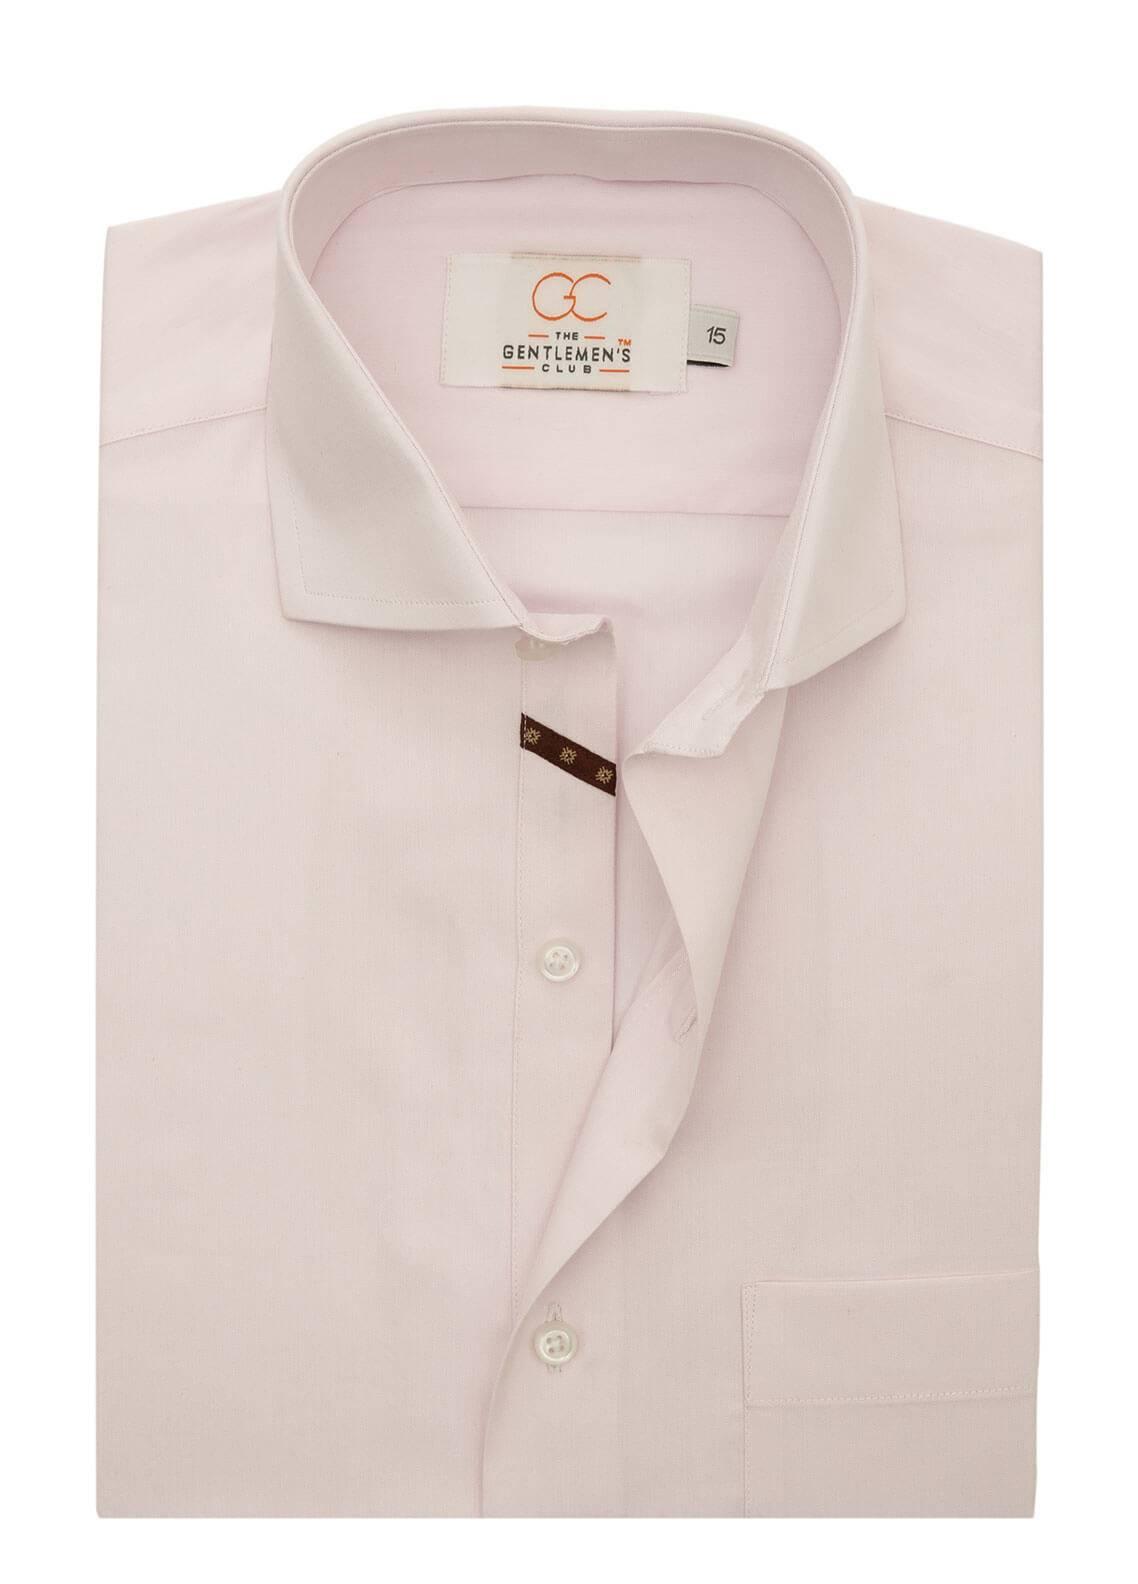 The Gentlemen's Club Cotton Formal Shirts for Men - Light Purple White Label 4072 - 18.5